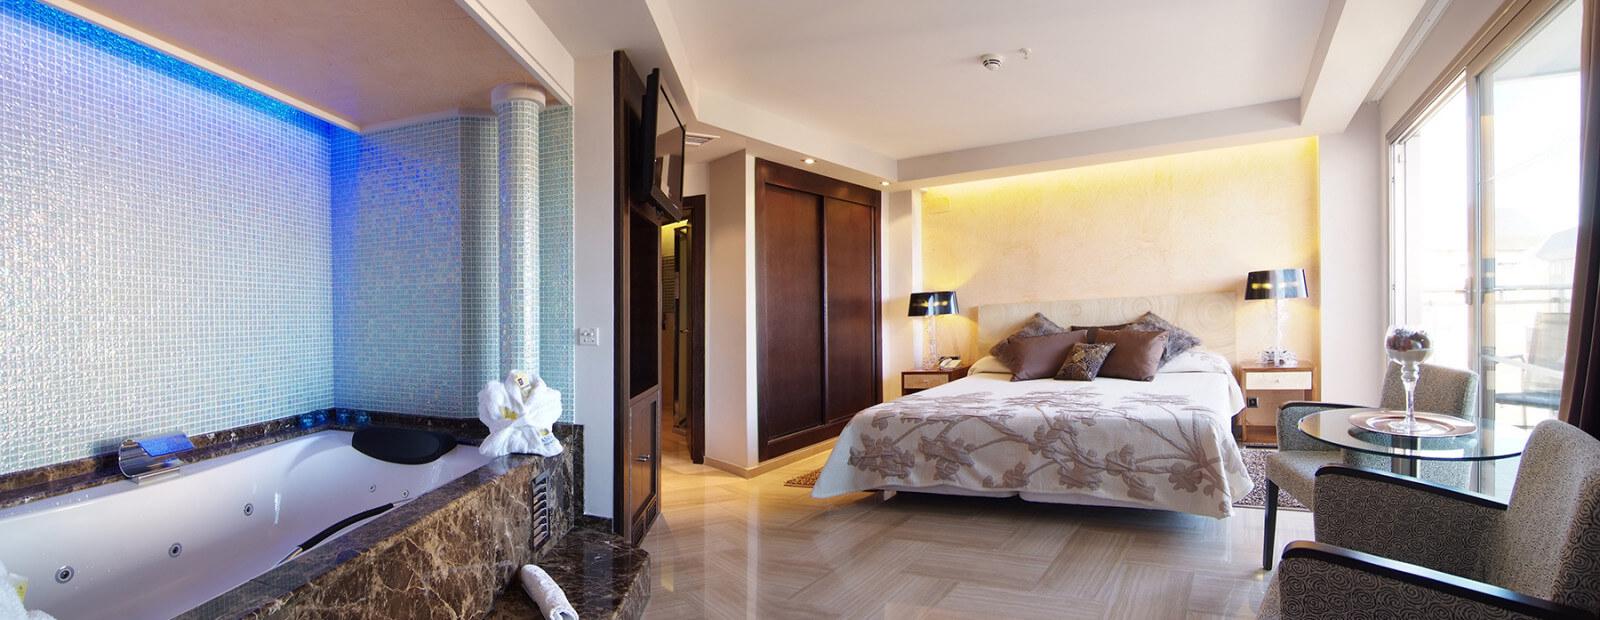 Sandos Suite